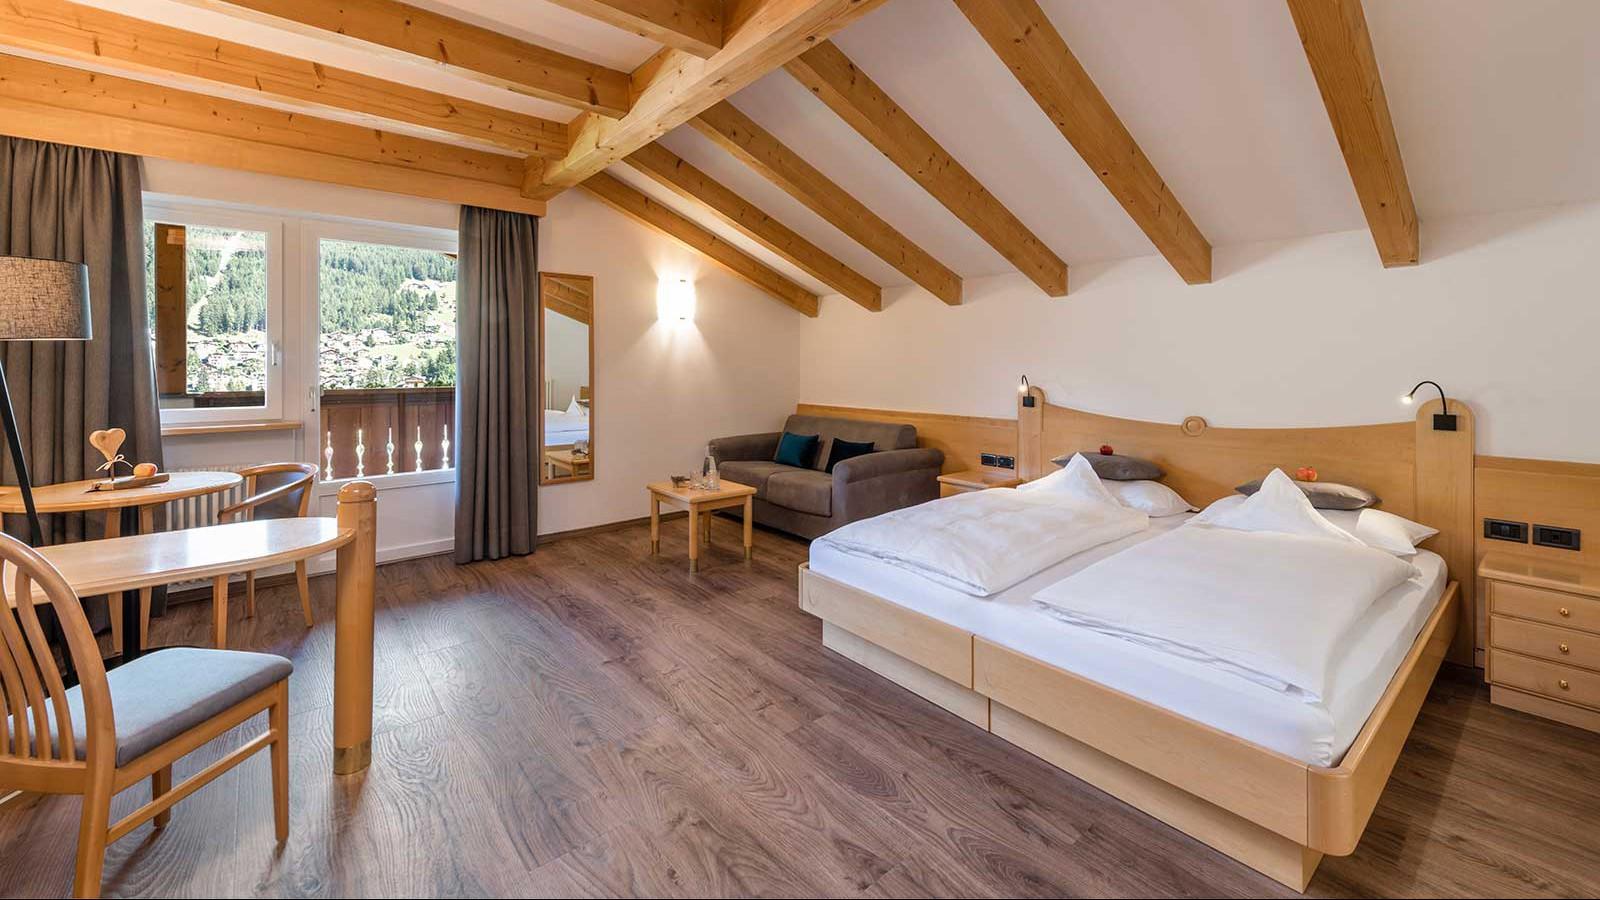 Alpenhotel Rainell  - Rooms